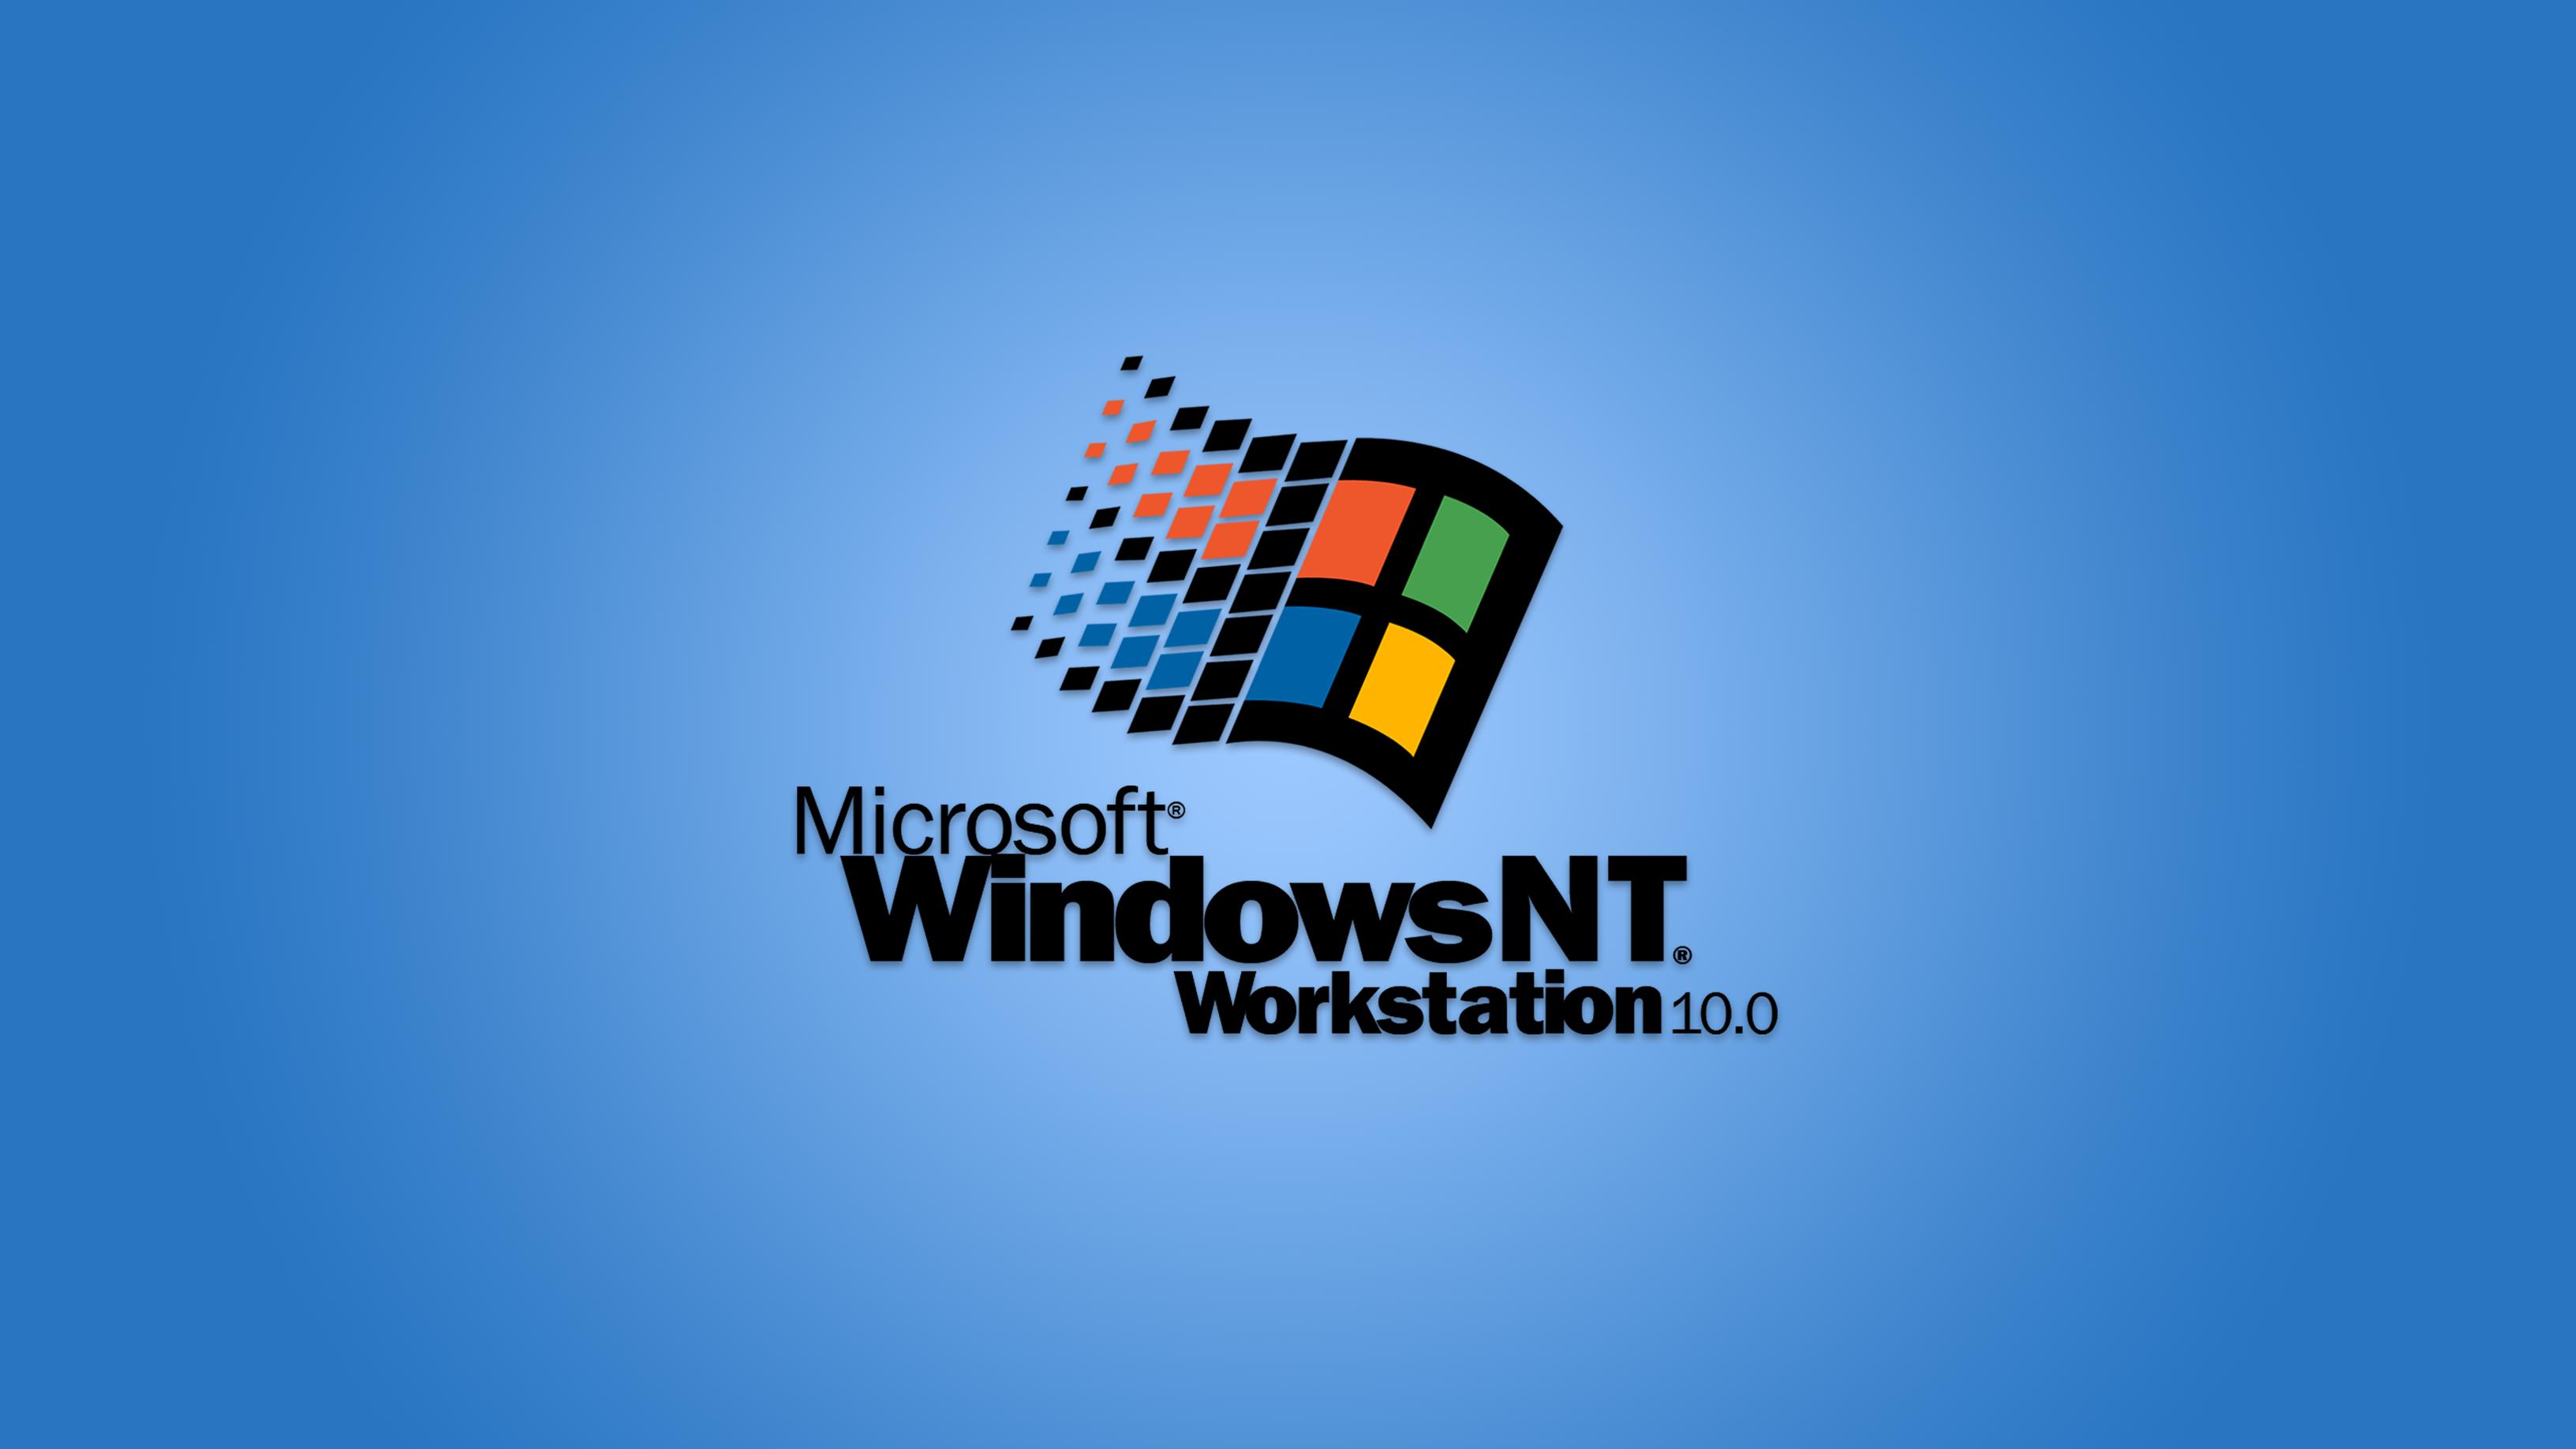 K Windows  Retro Wallpaper By Samforbis